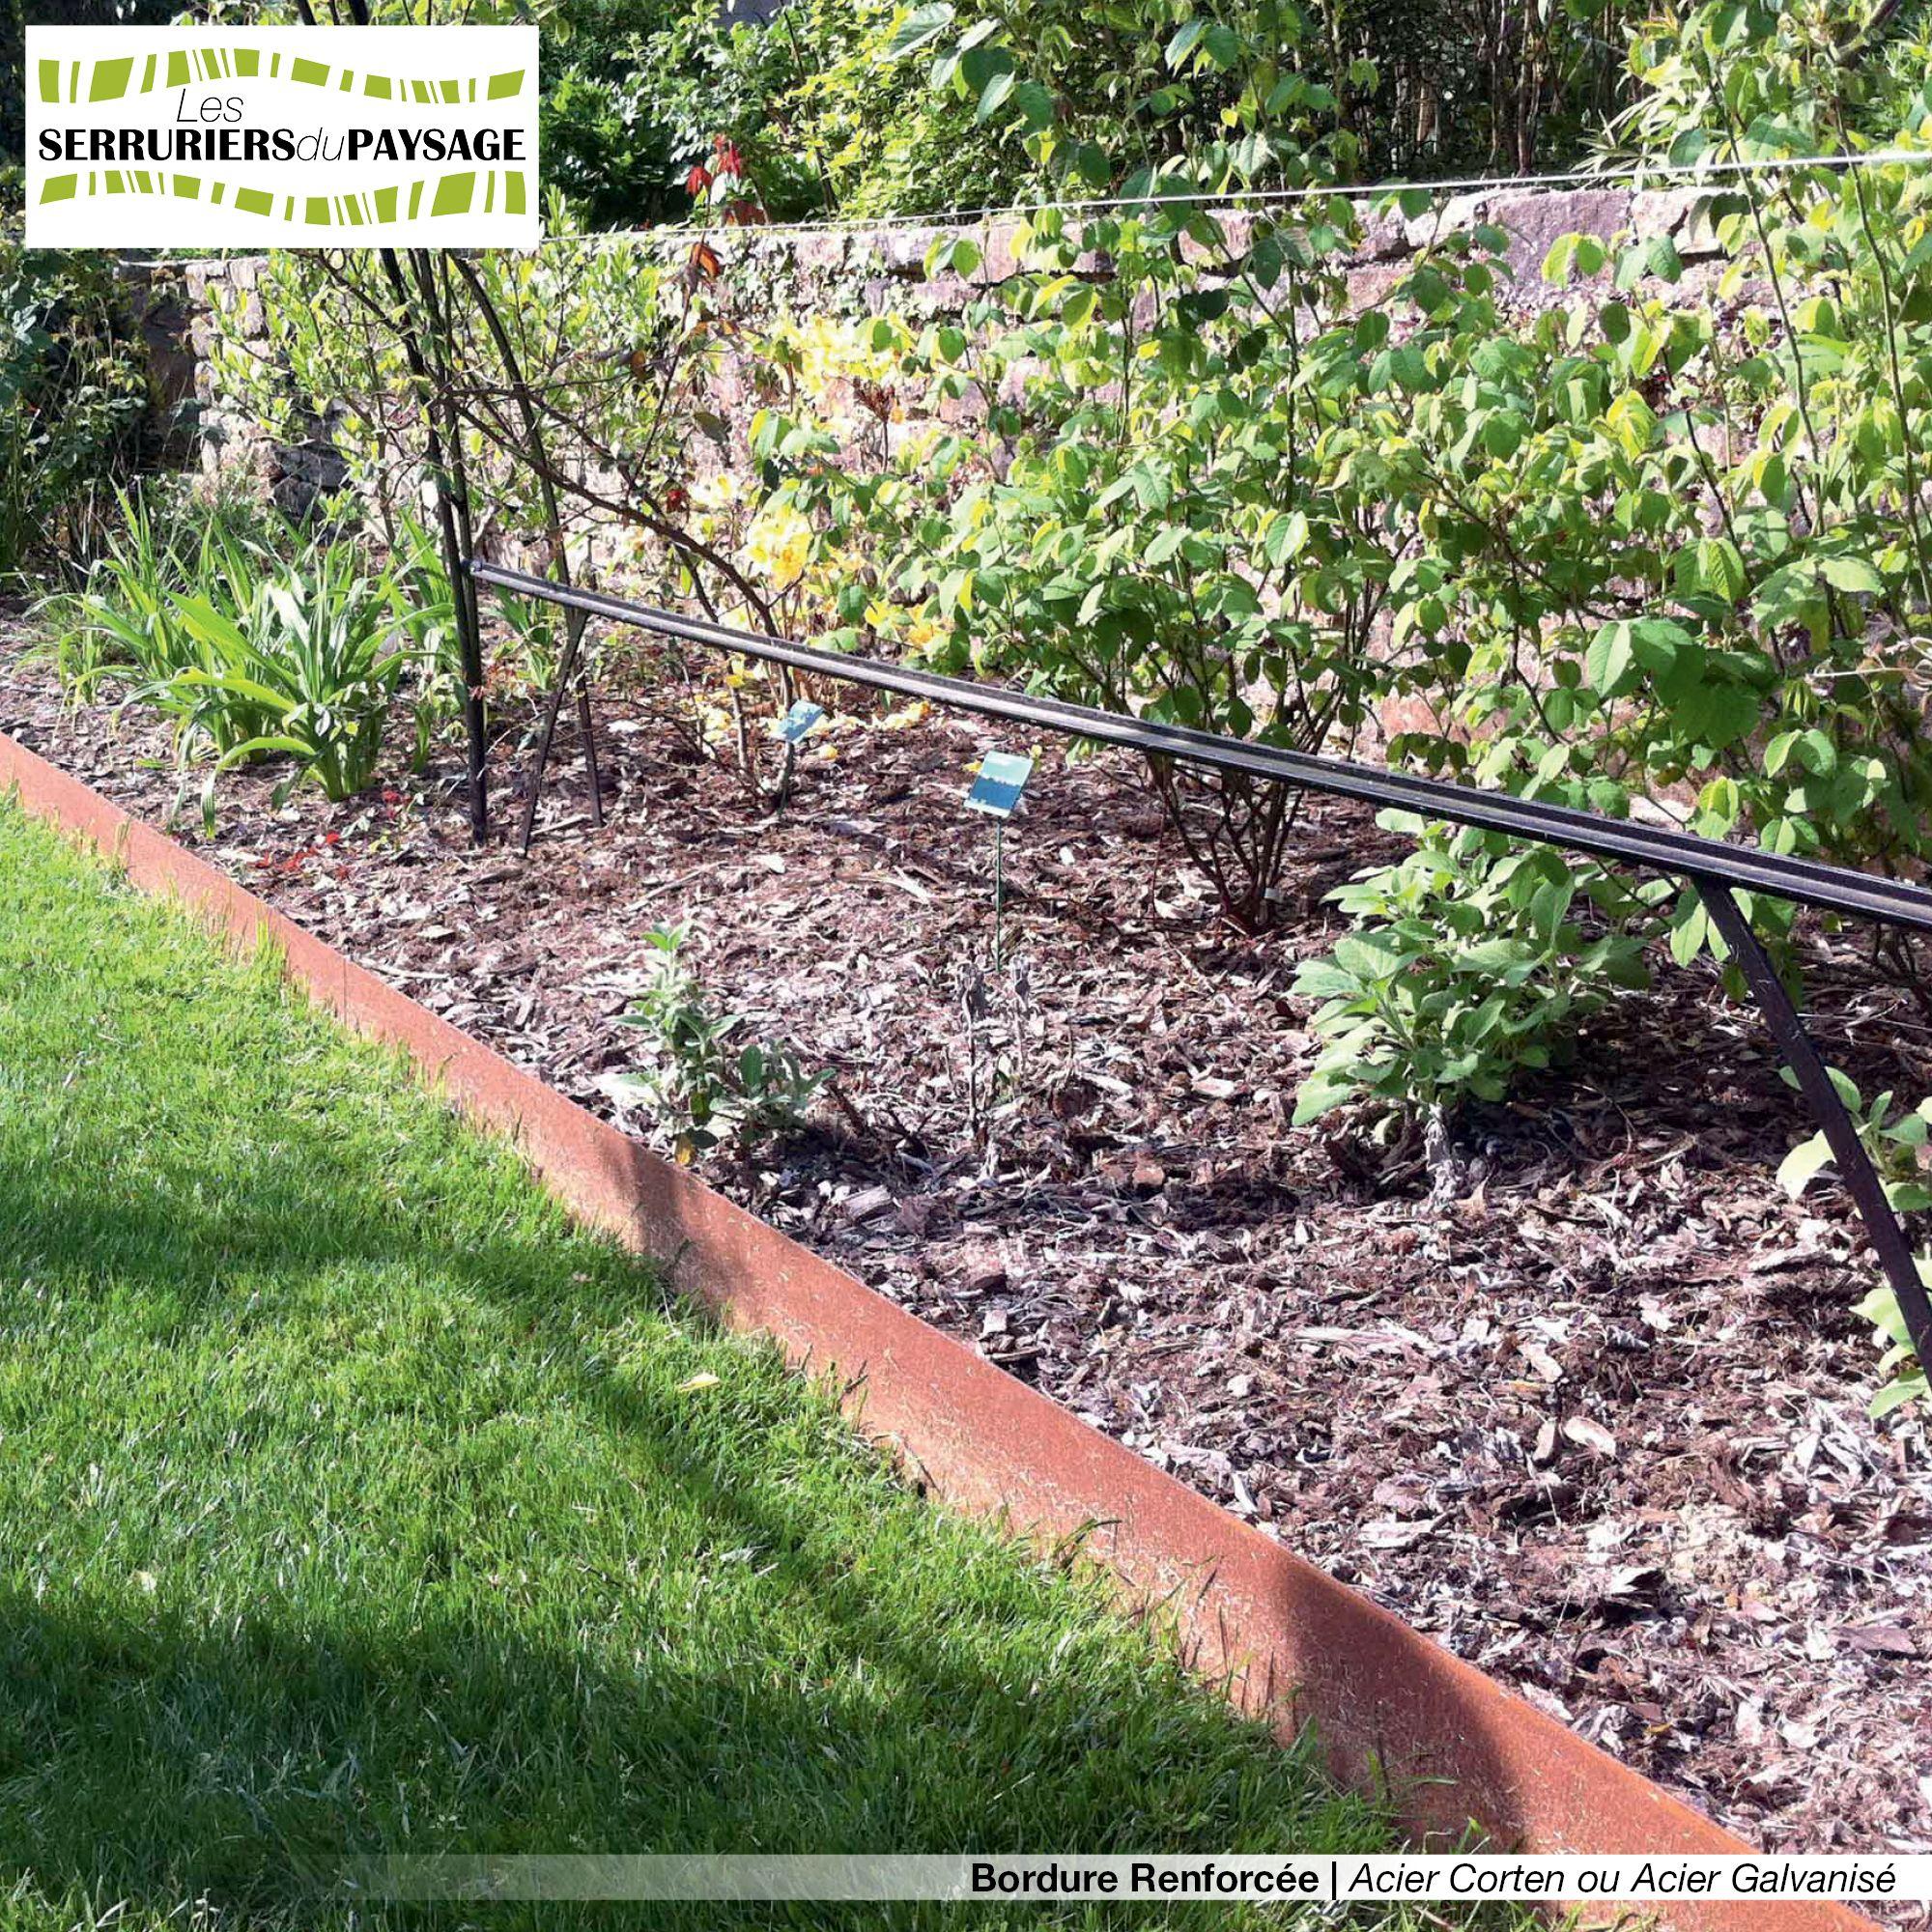 Bordure De Jardin En Tôle Acier Galvanisé Ou Tôle Acier ... avec Bordure Jardin Acier Corten